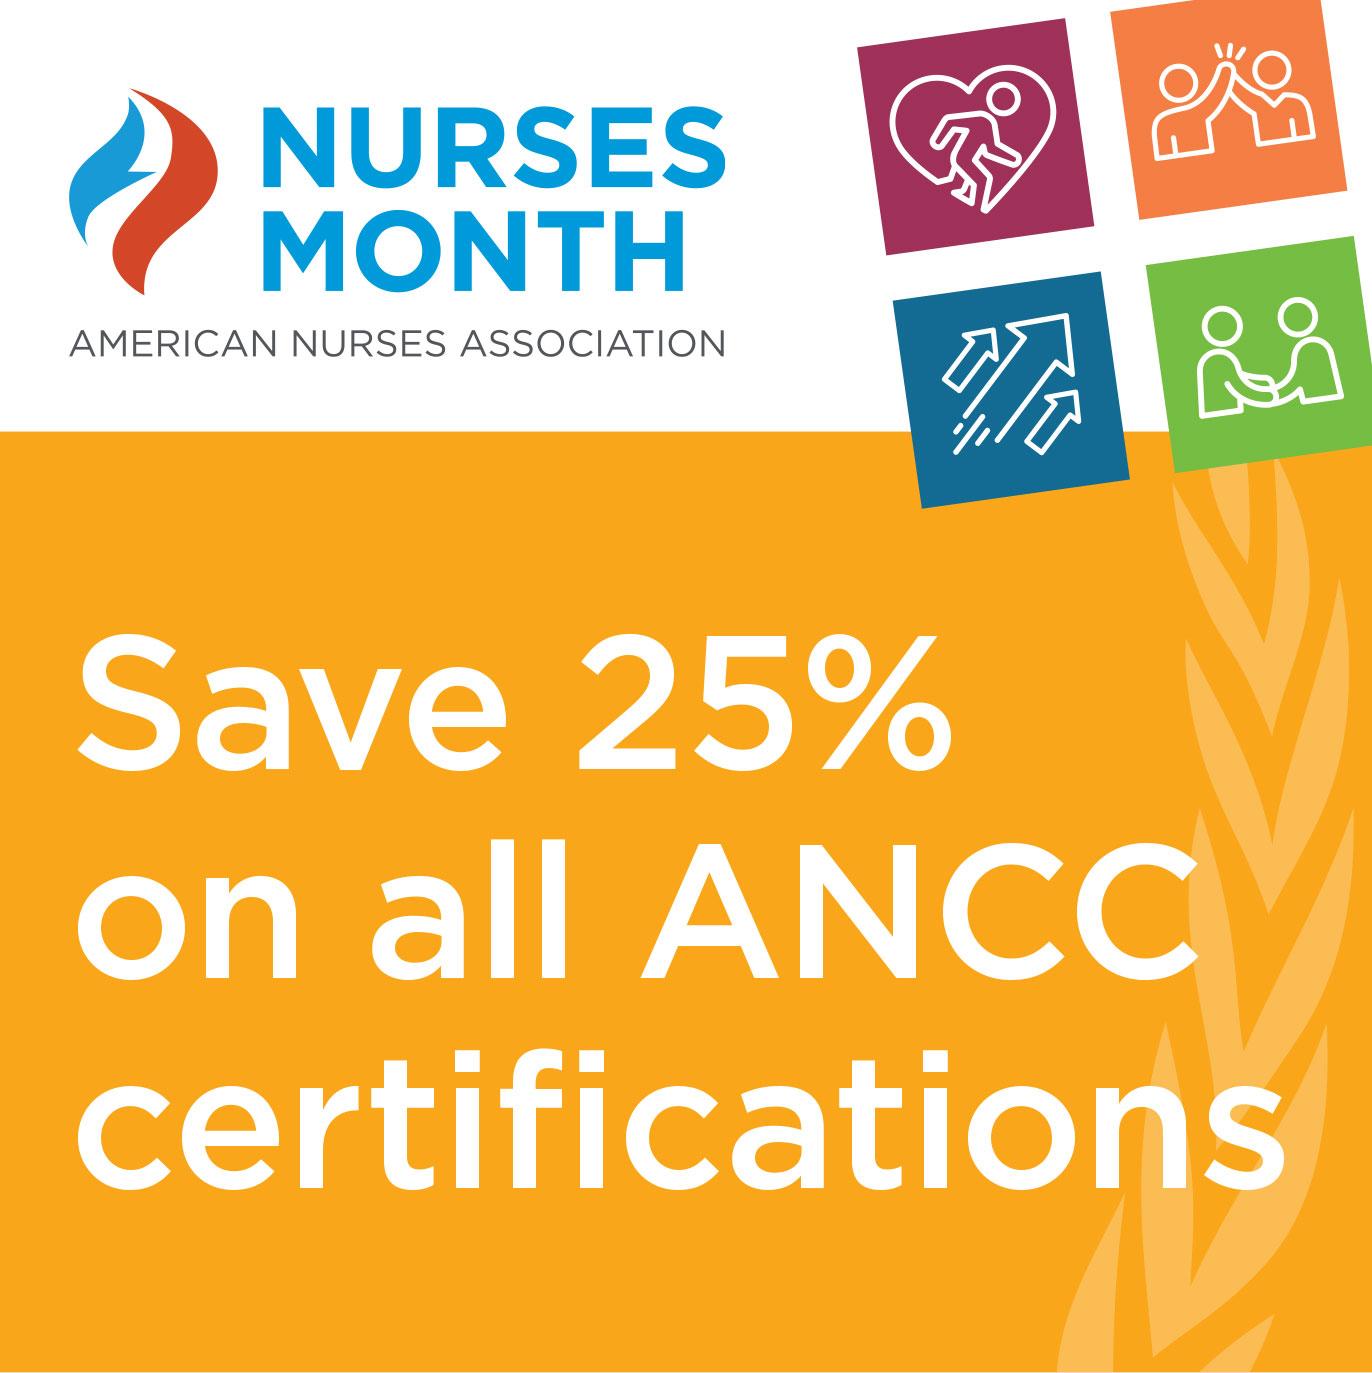 Nurses Month Save Twenty Five Percent OnAll ANCC Certifications